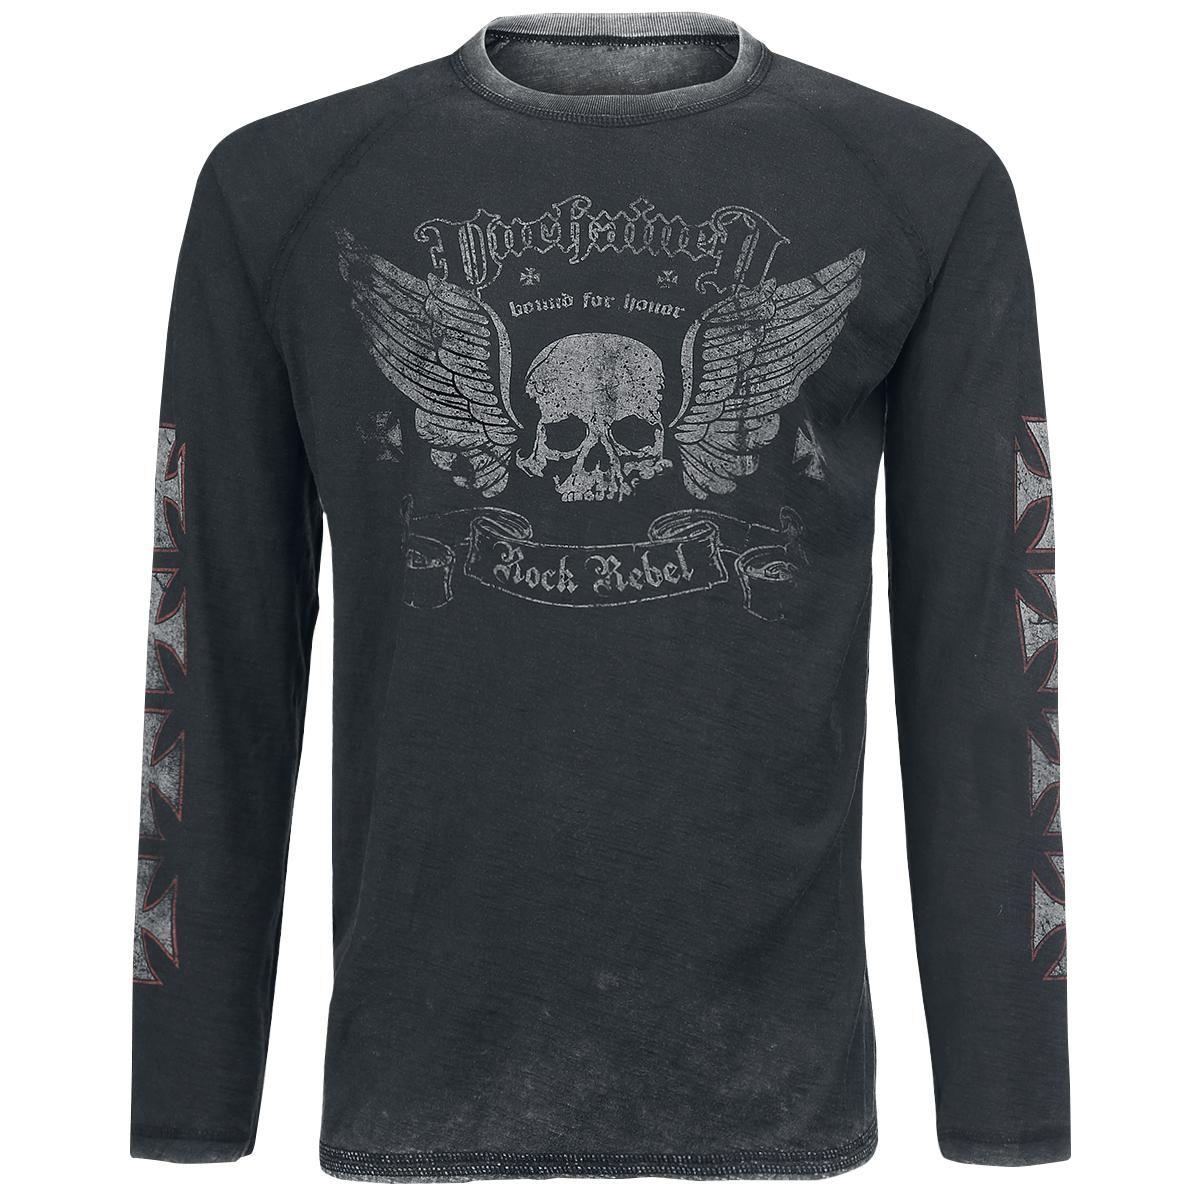 Rock Rebel by EMP esittelee miesten tyylikkäimmän pitkähihaisen: http://www.emp.fi/rock-rebel-by-emp-bound-for-honor-pitkahihainen-paita/art_287594/?campaign=emp/fi/sm/pin/promotion/desk/14102014-287594